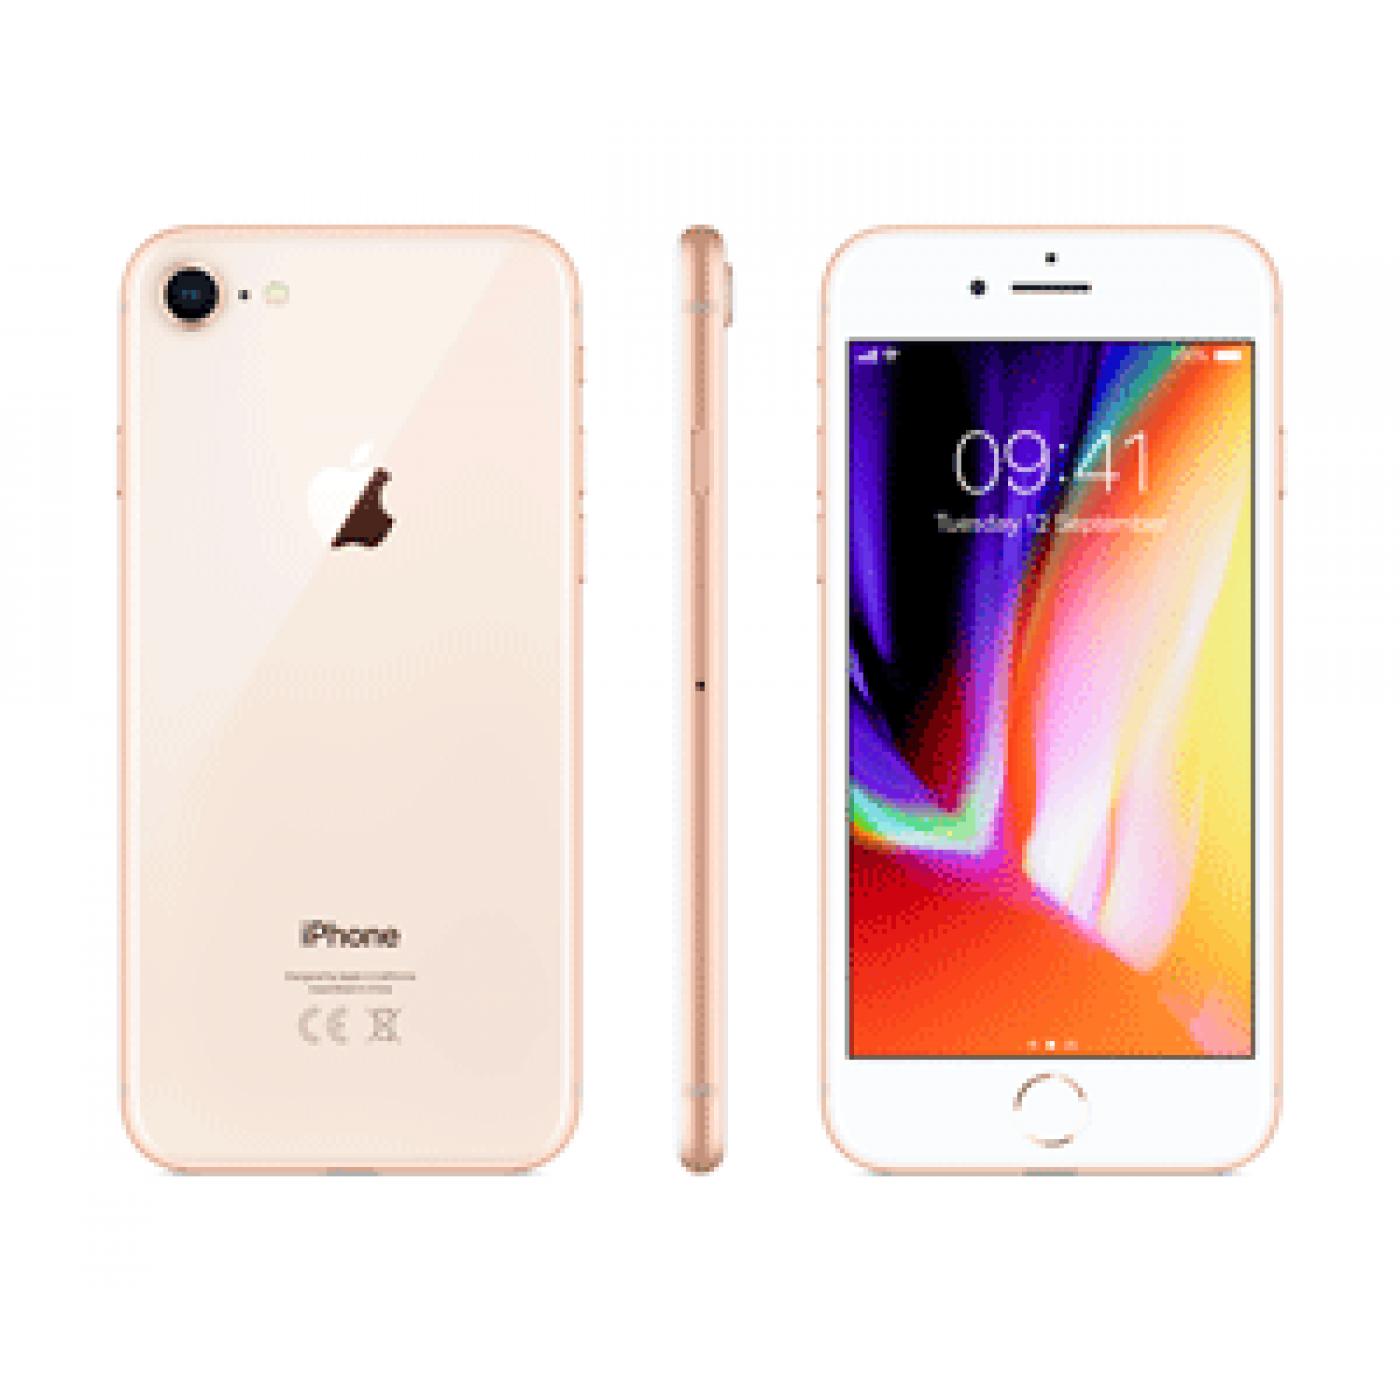 Apple iPhone 8 64GB Cellphone Gold.